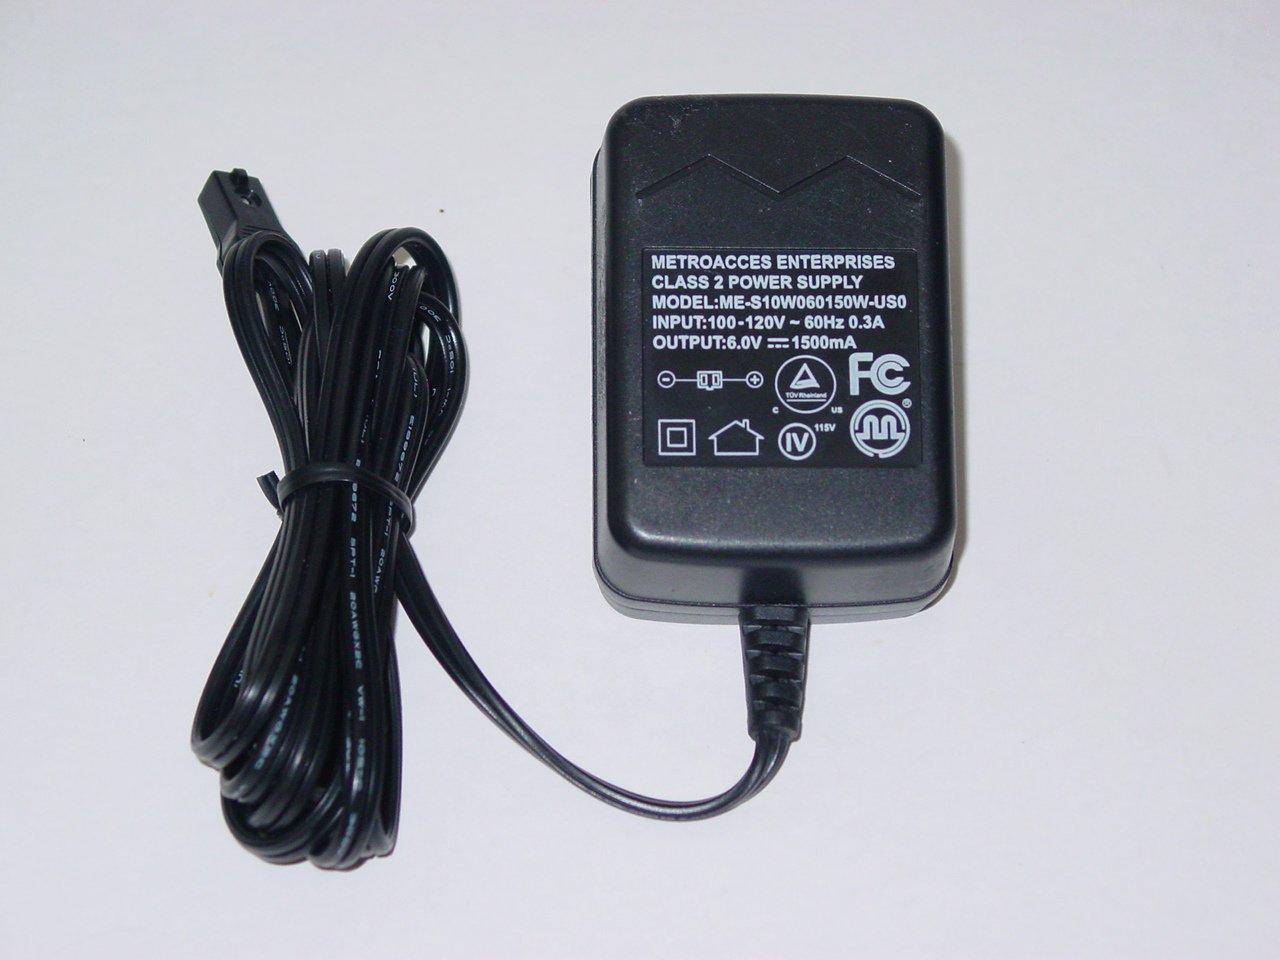 Metroacces Enterprises ME-S10W060150W-US0 AC Power Adapter 6V 1500mA